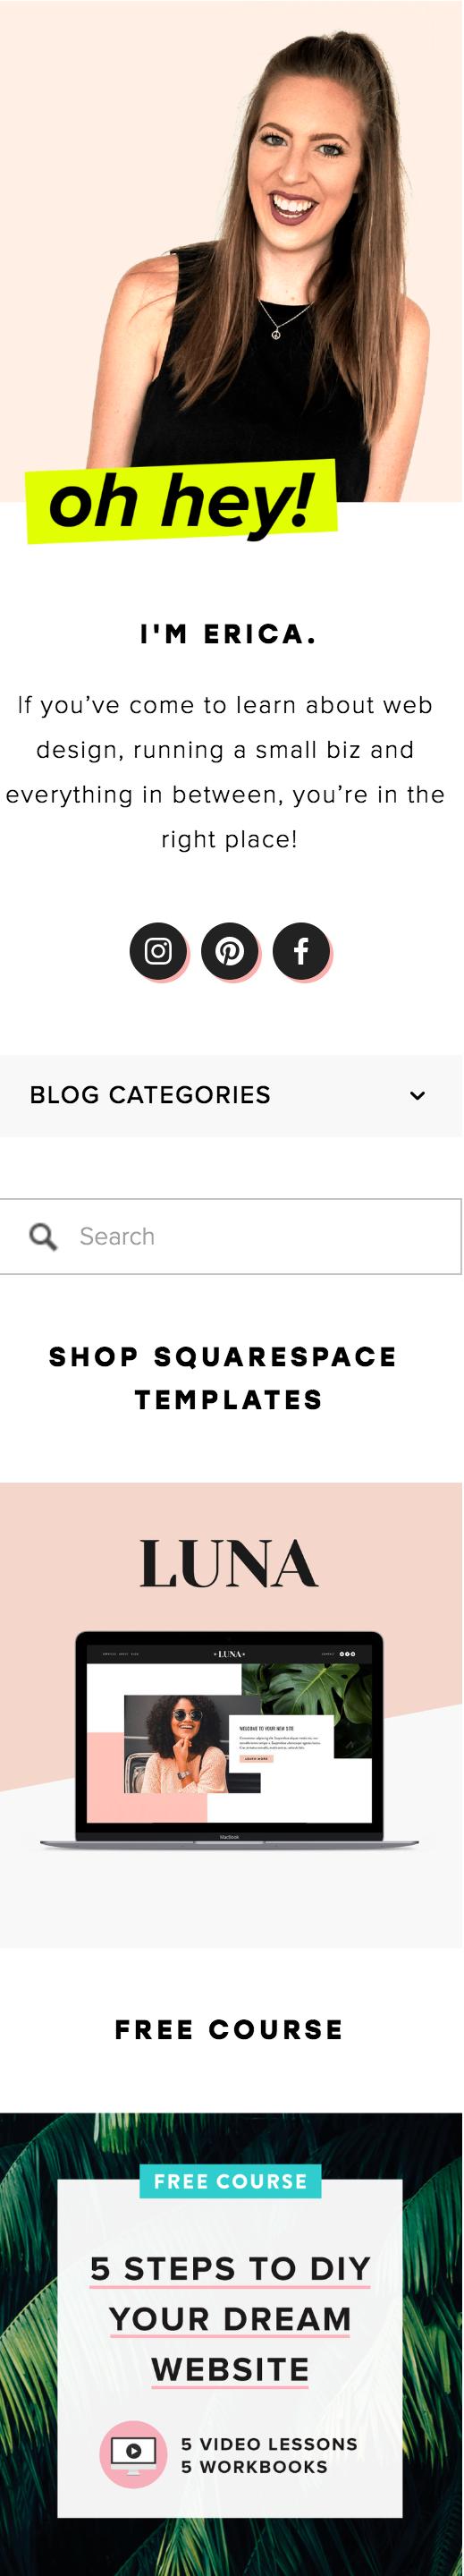 Squarespace Sidebar Example - Big Cat Creative